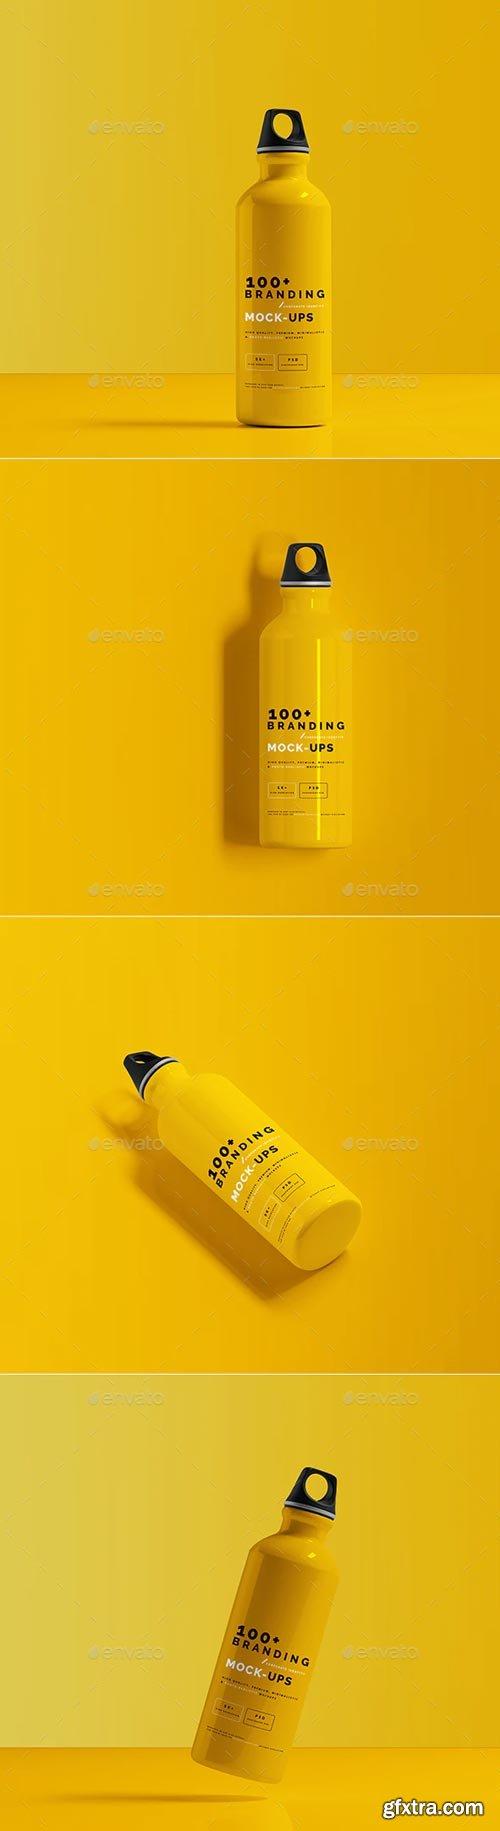 GraphicRiver - Aluminum Water Bottle Mockup - 29499327